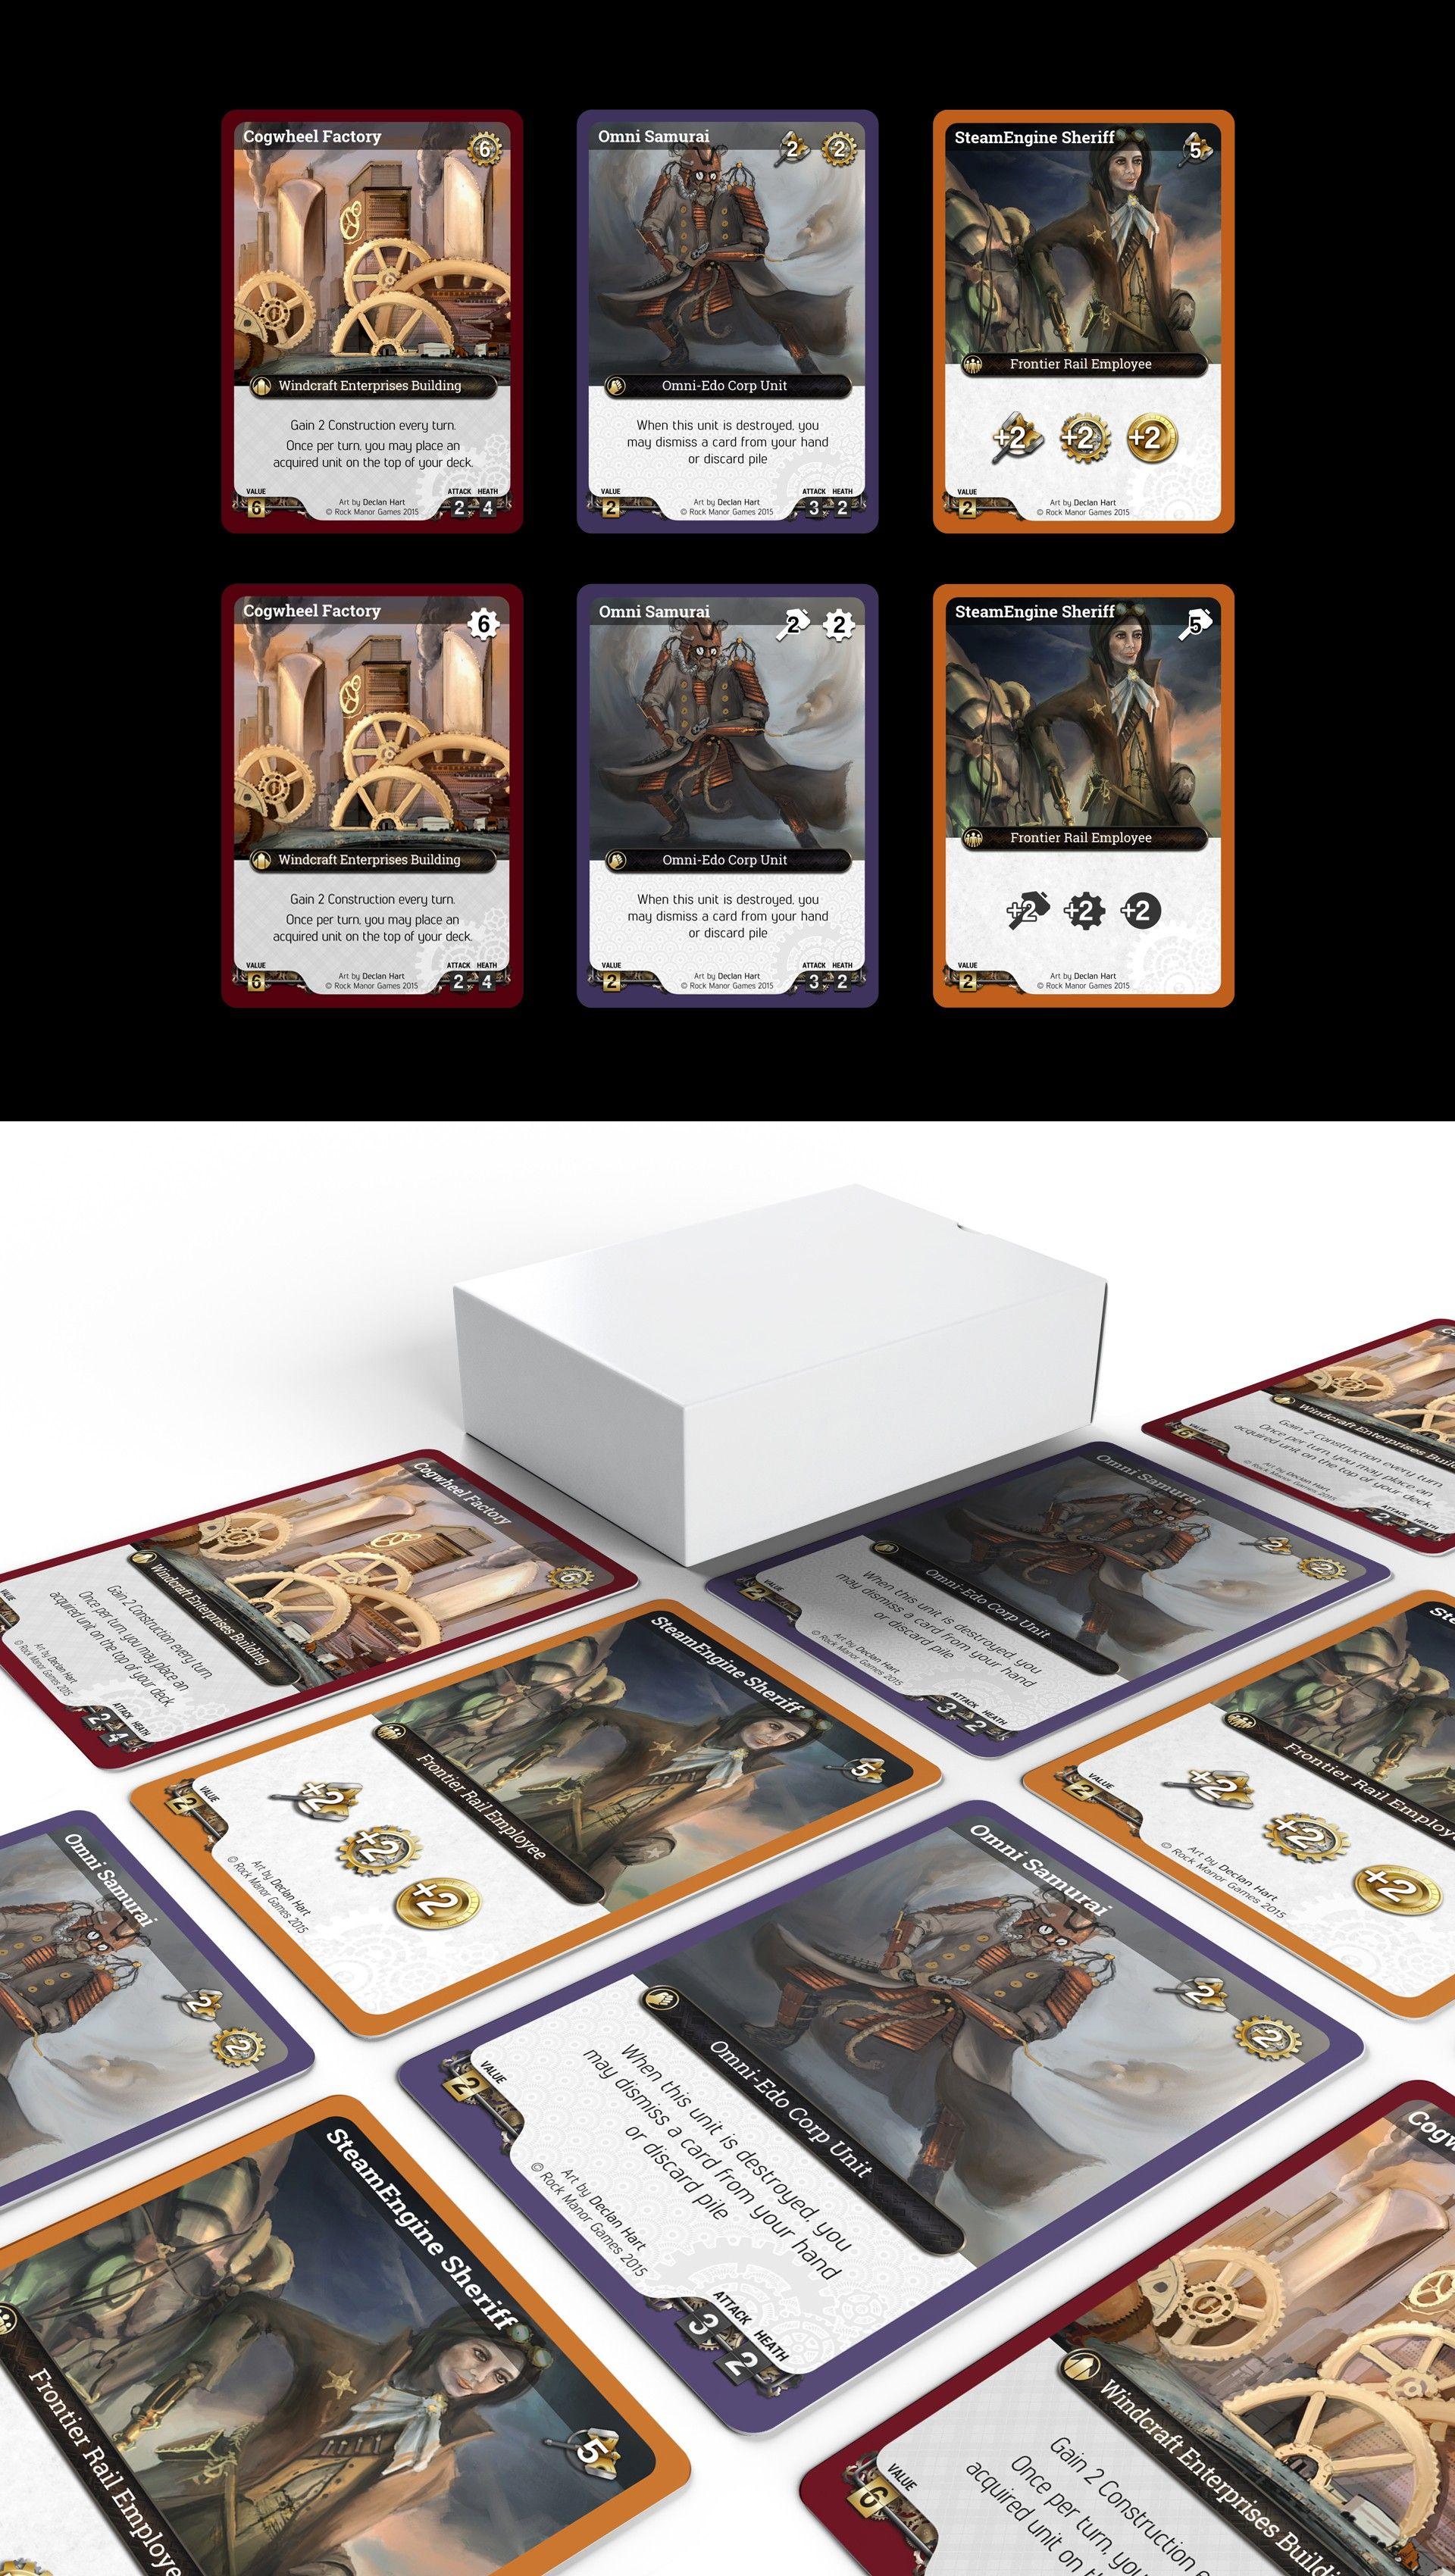 Steampunk Card Game Design 99designs Game Card Design Game Design Card Games